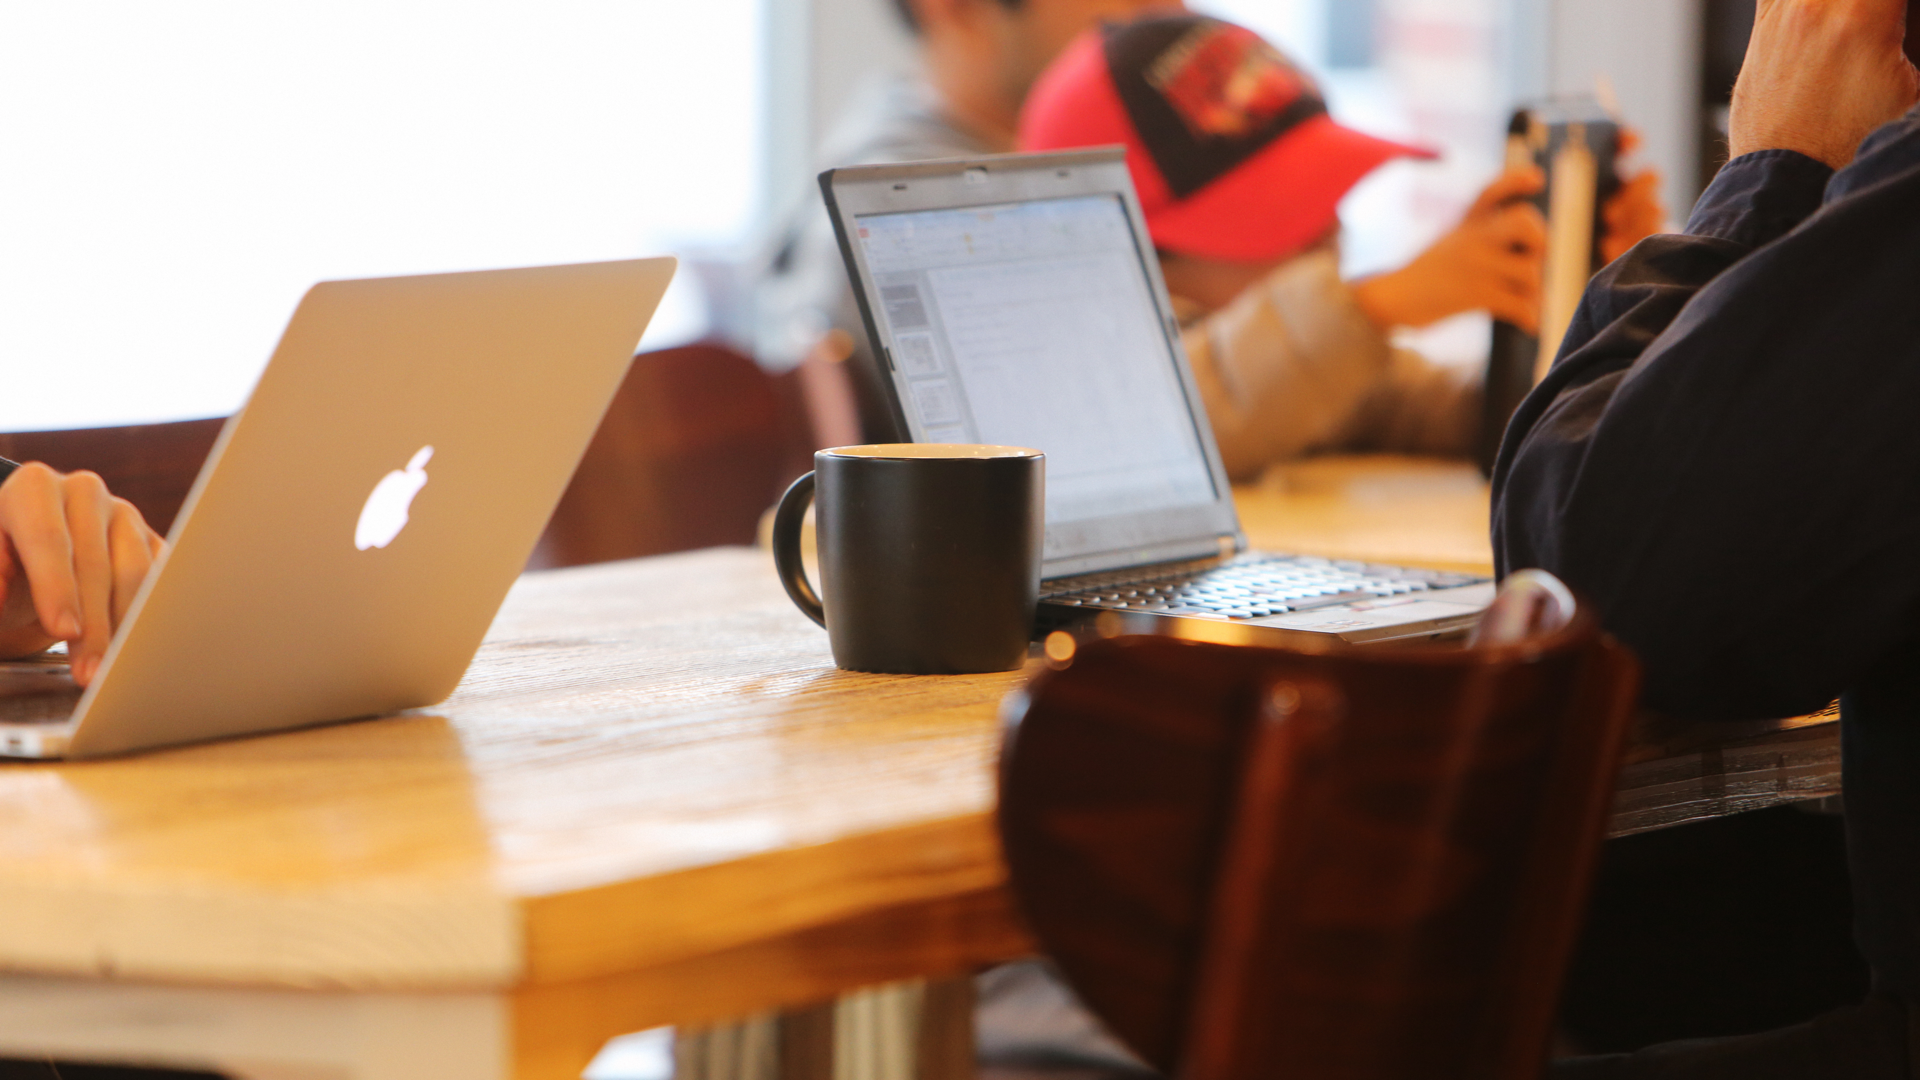 Mac coffee shop